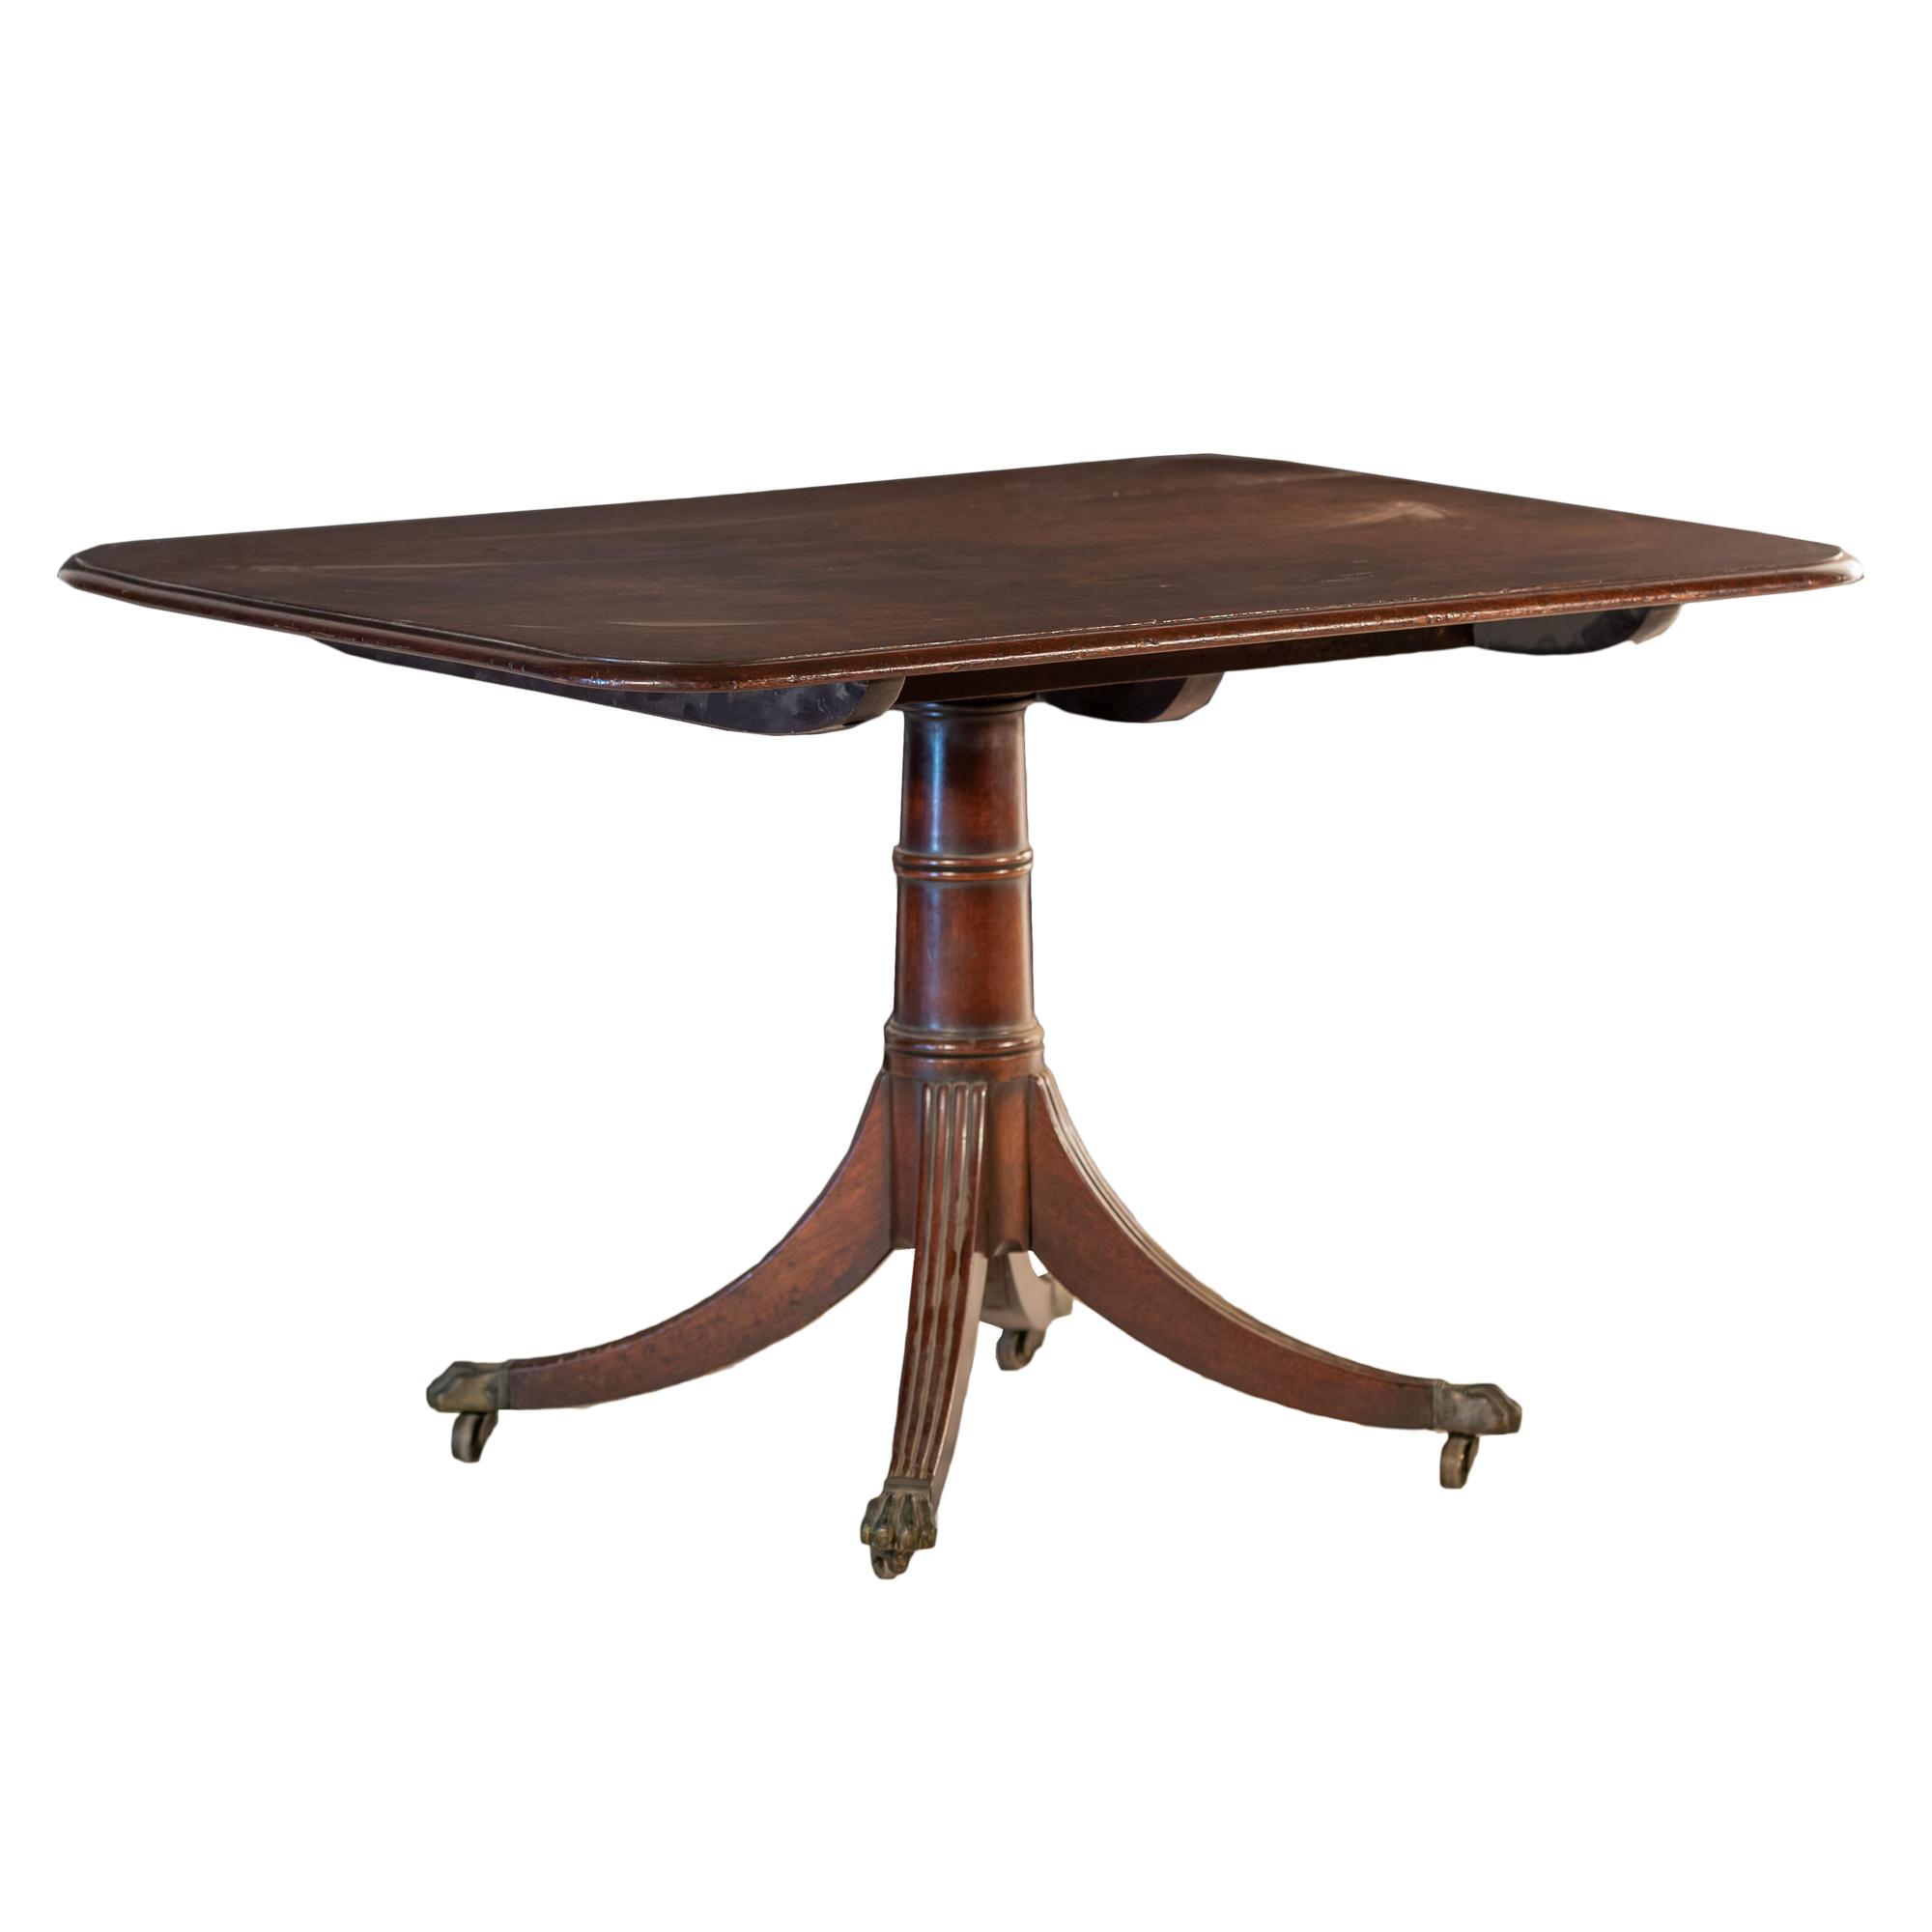 'Regency Mahogany Tilt Top Supper Table with Quadruped Base Circa 1815'